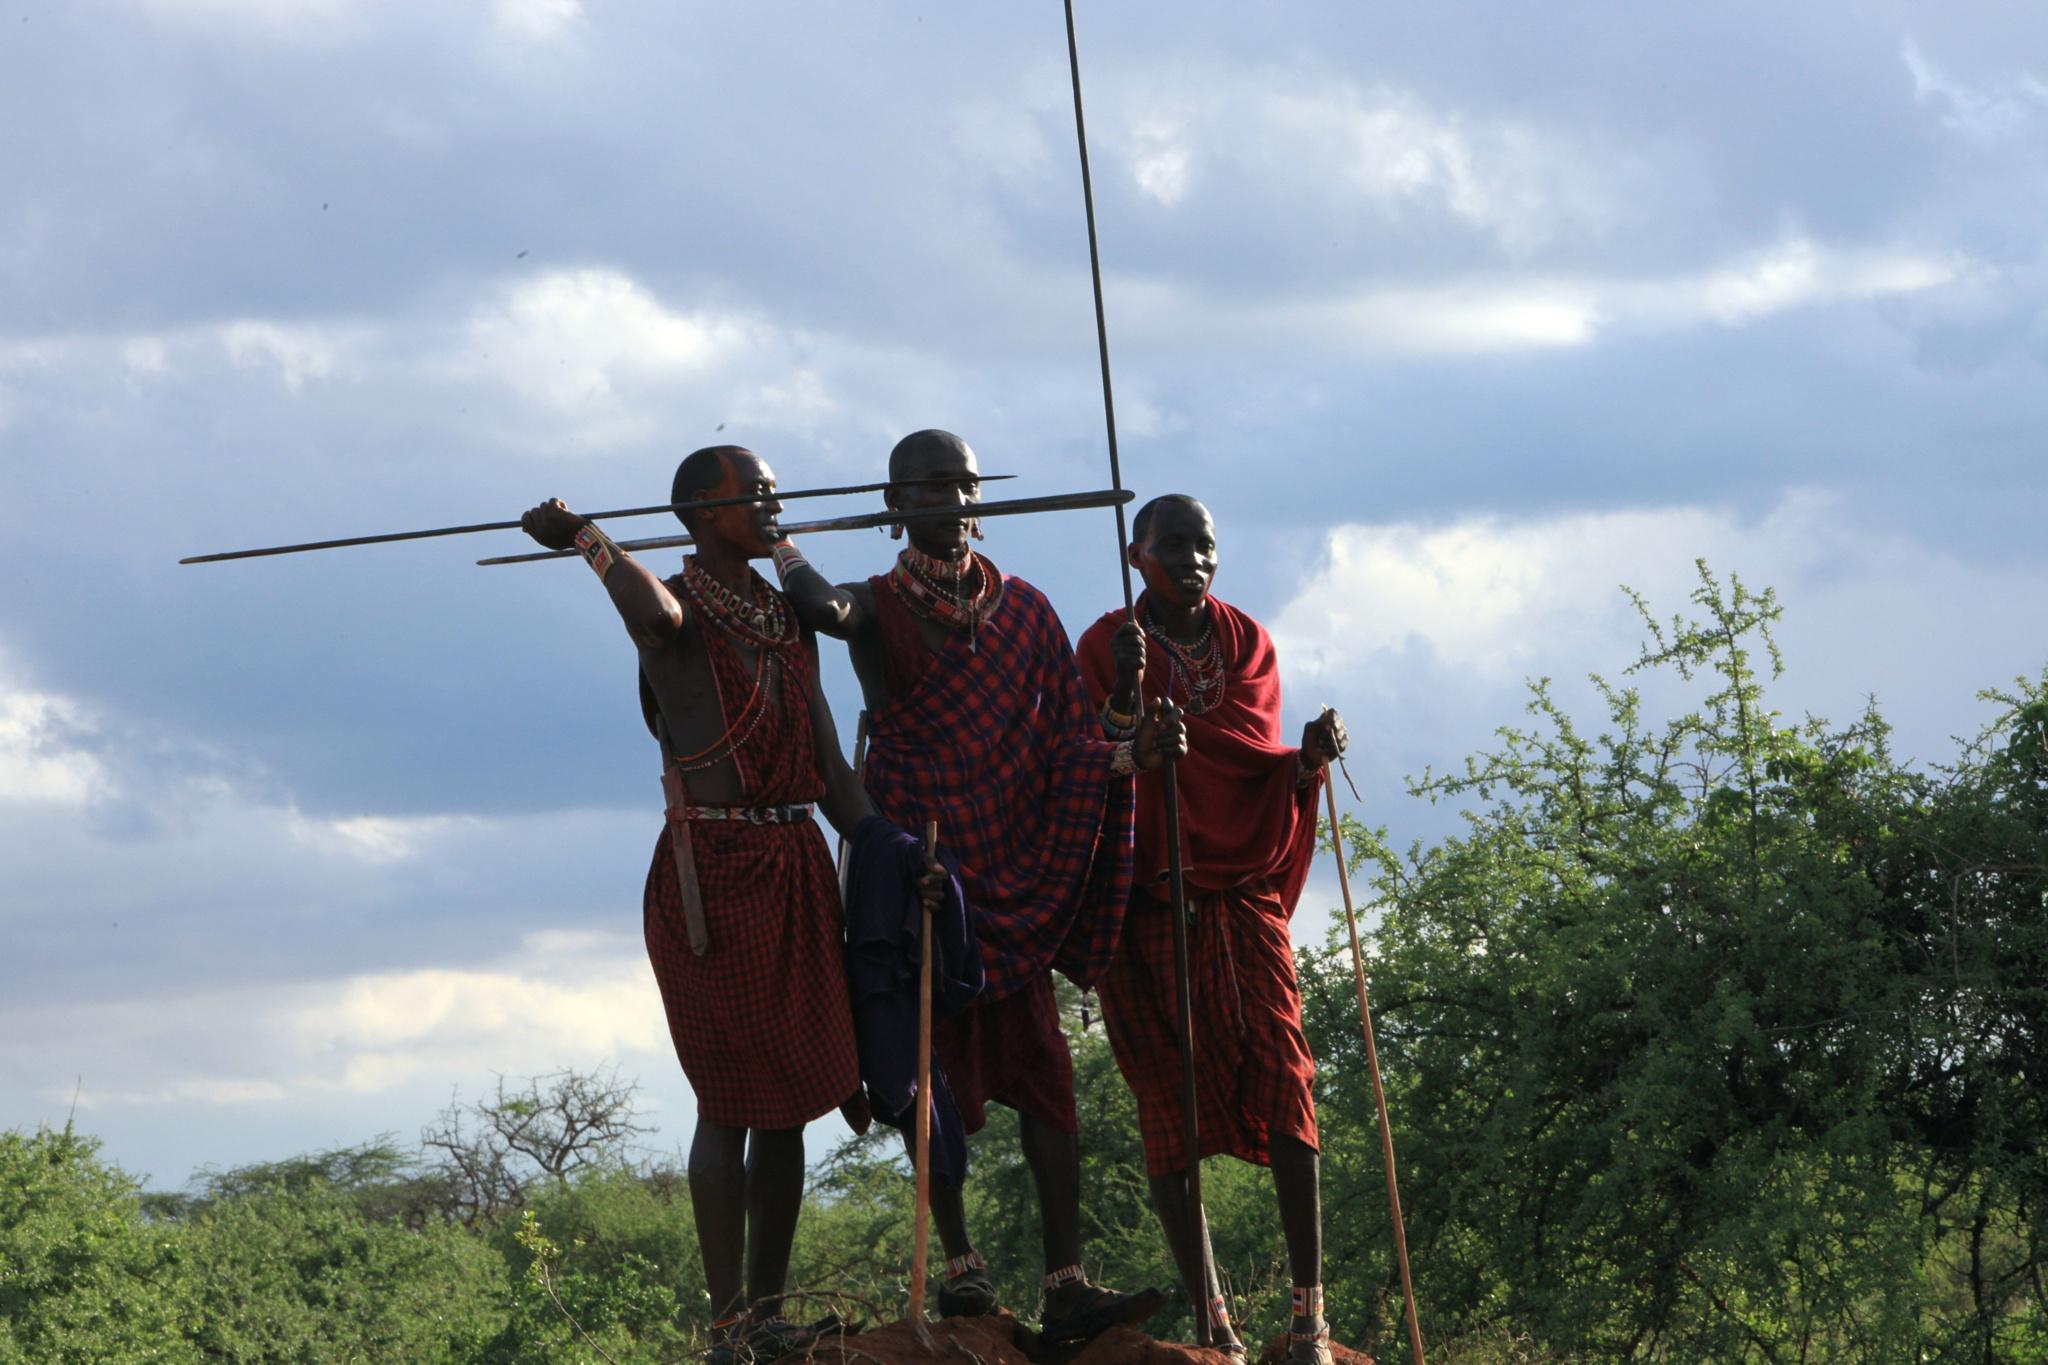 The Maasai, Kenya by robteilets